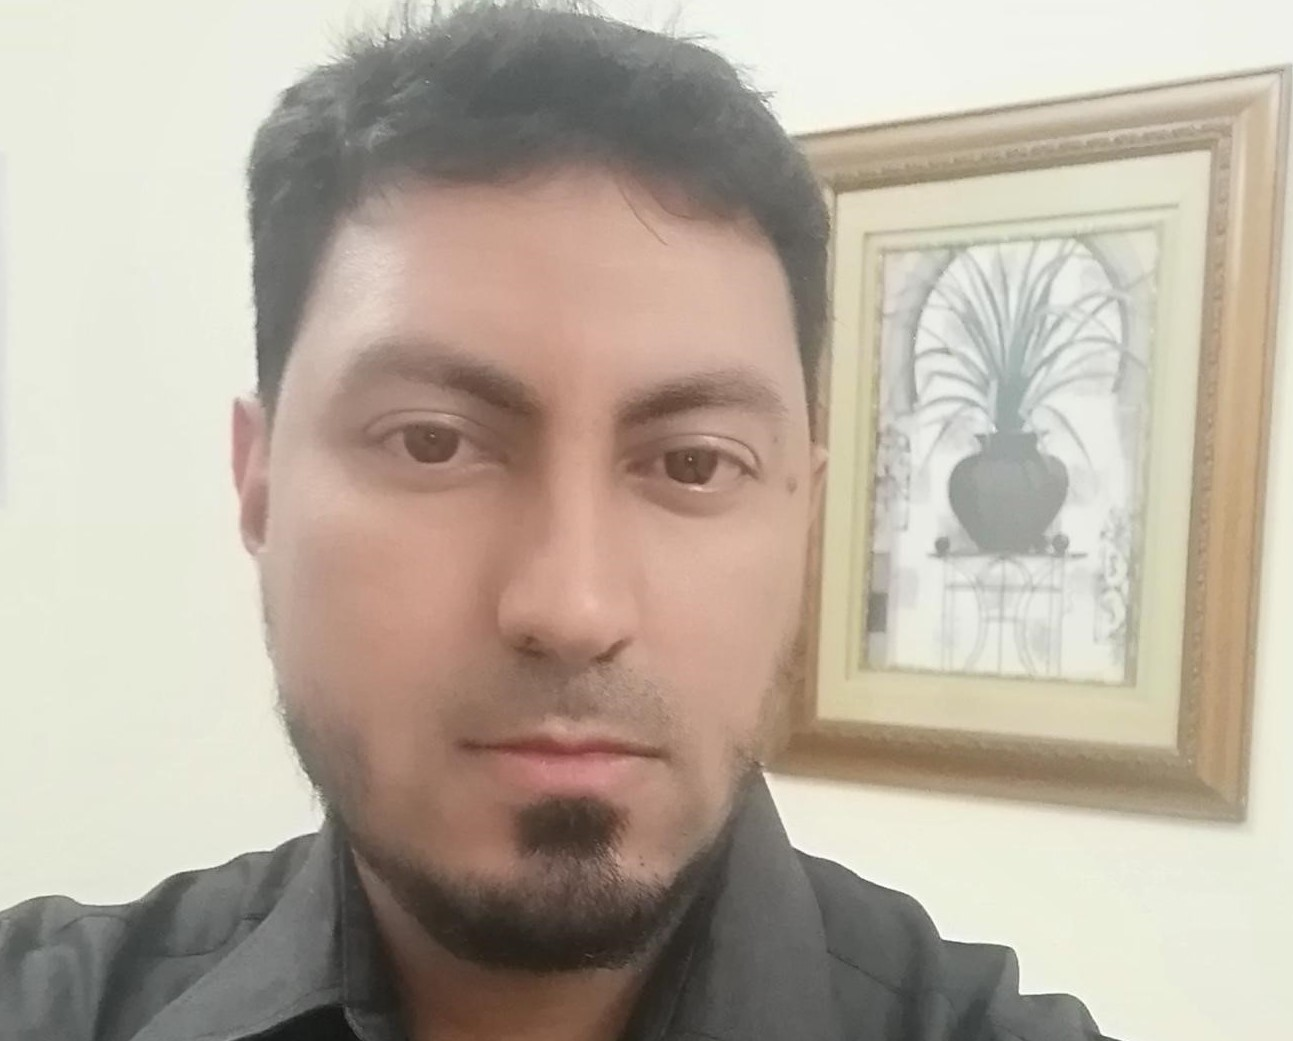 محمود يوسف ابوعرقوب